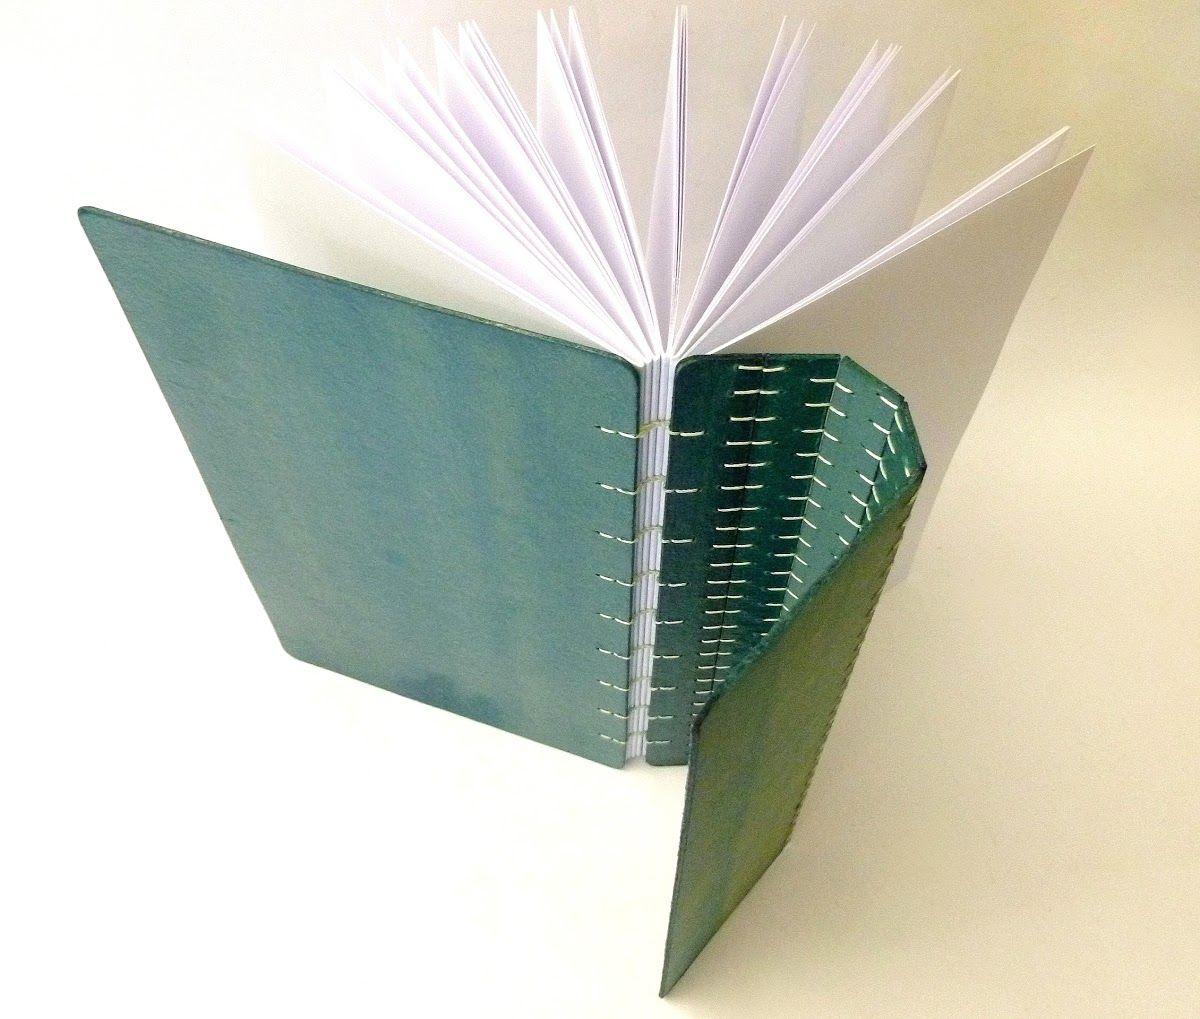 The Art Of Bookbinding Bookbinding Handmade Books Handmade Book